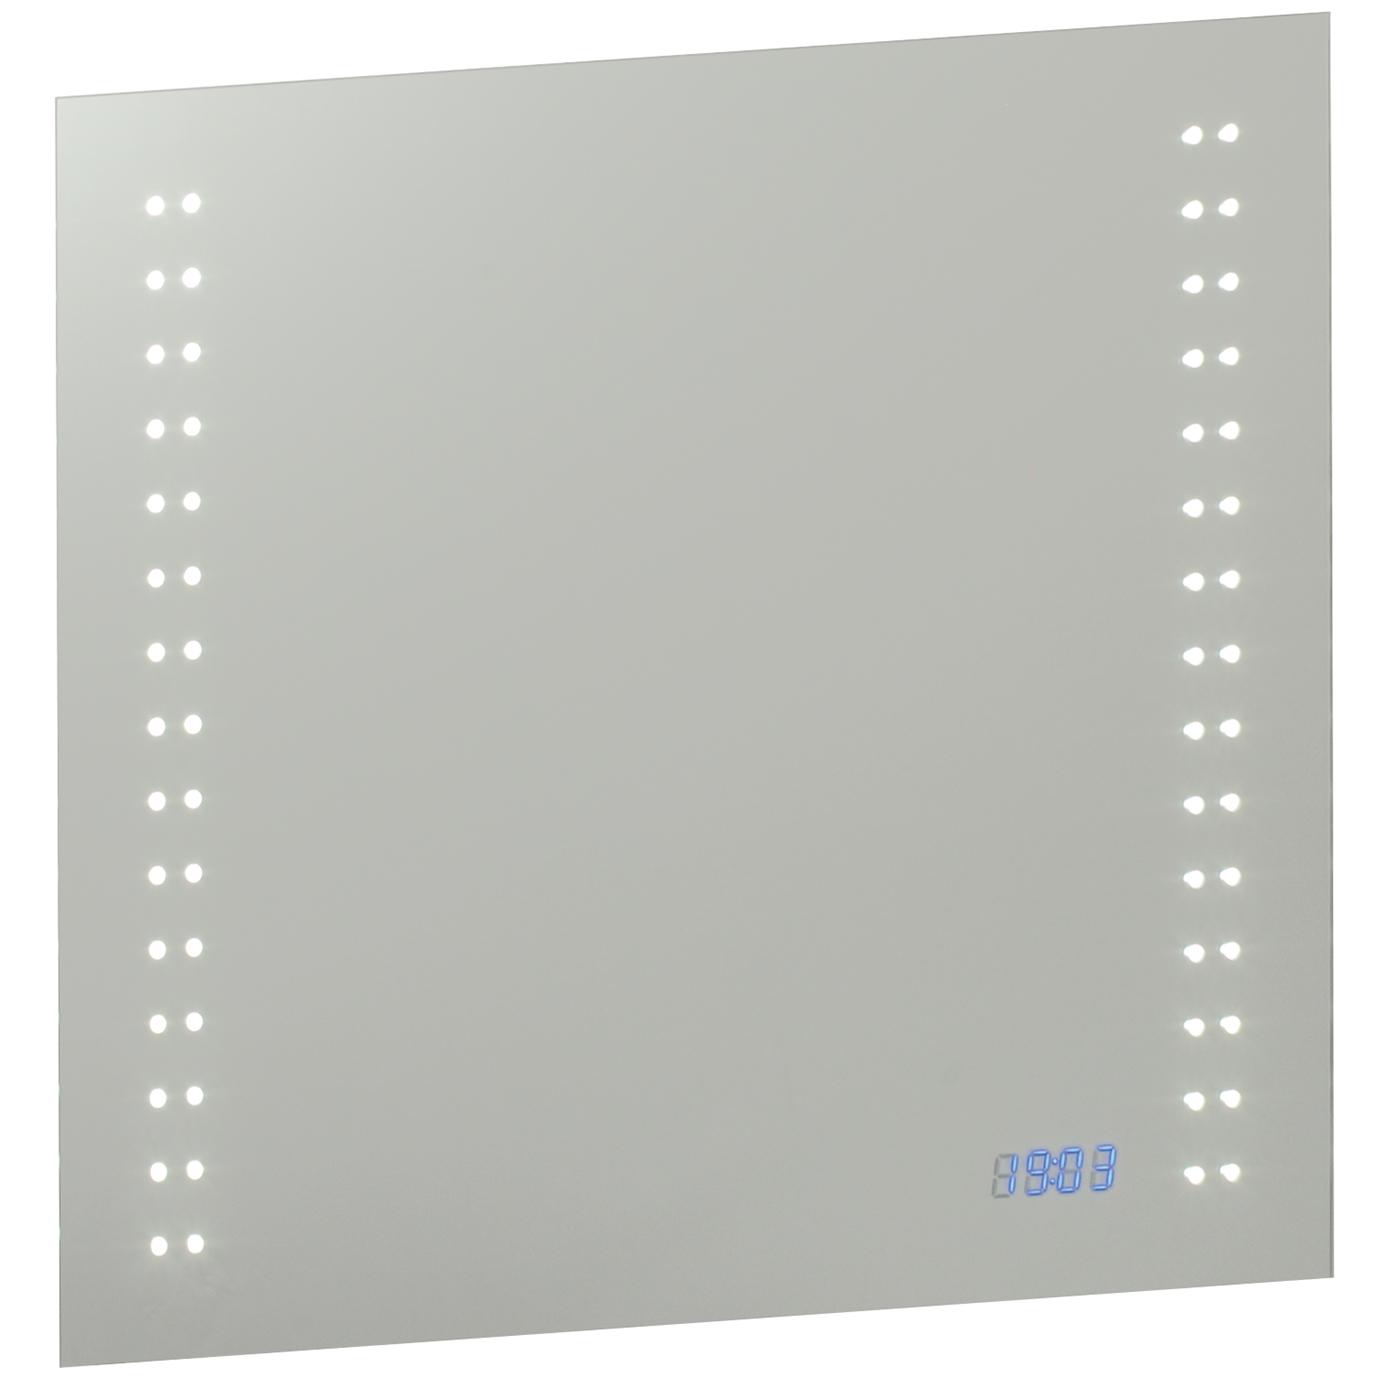 Endon 39233 Mirror Light 60xLEDs 2x2.1W